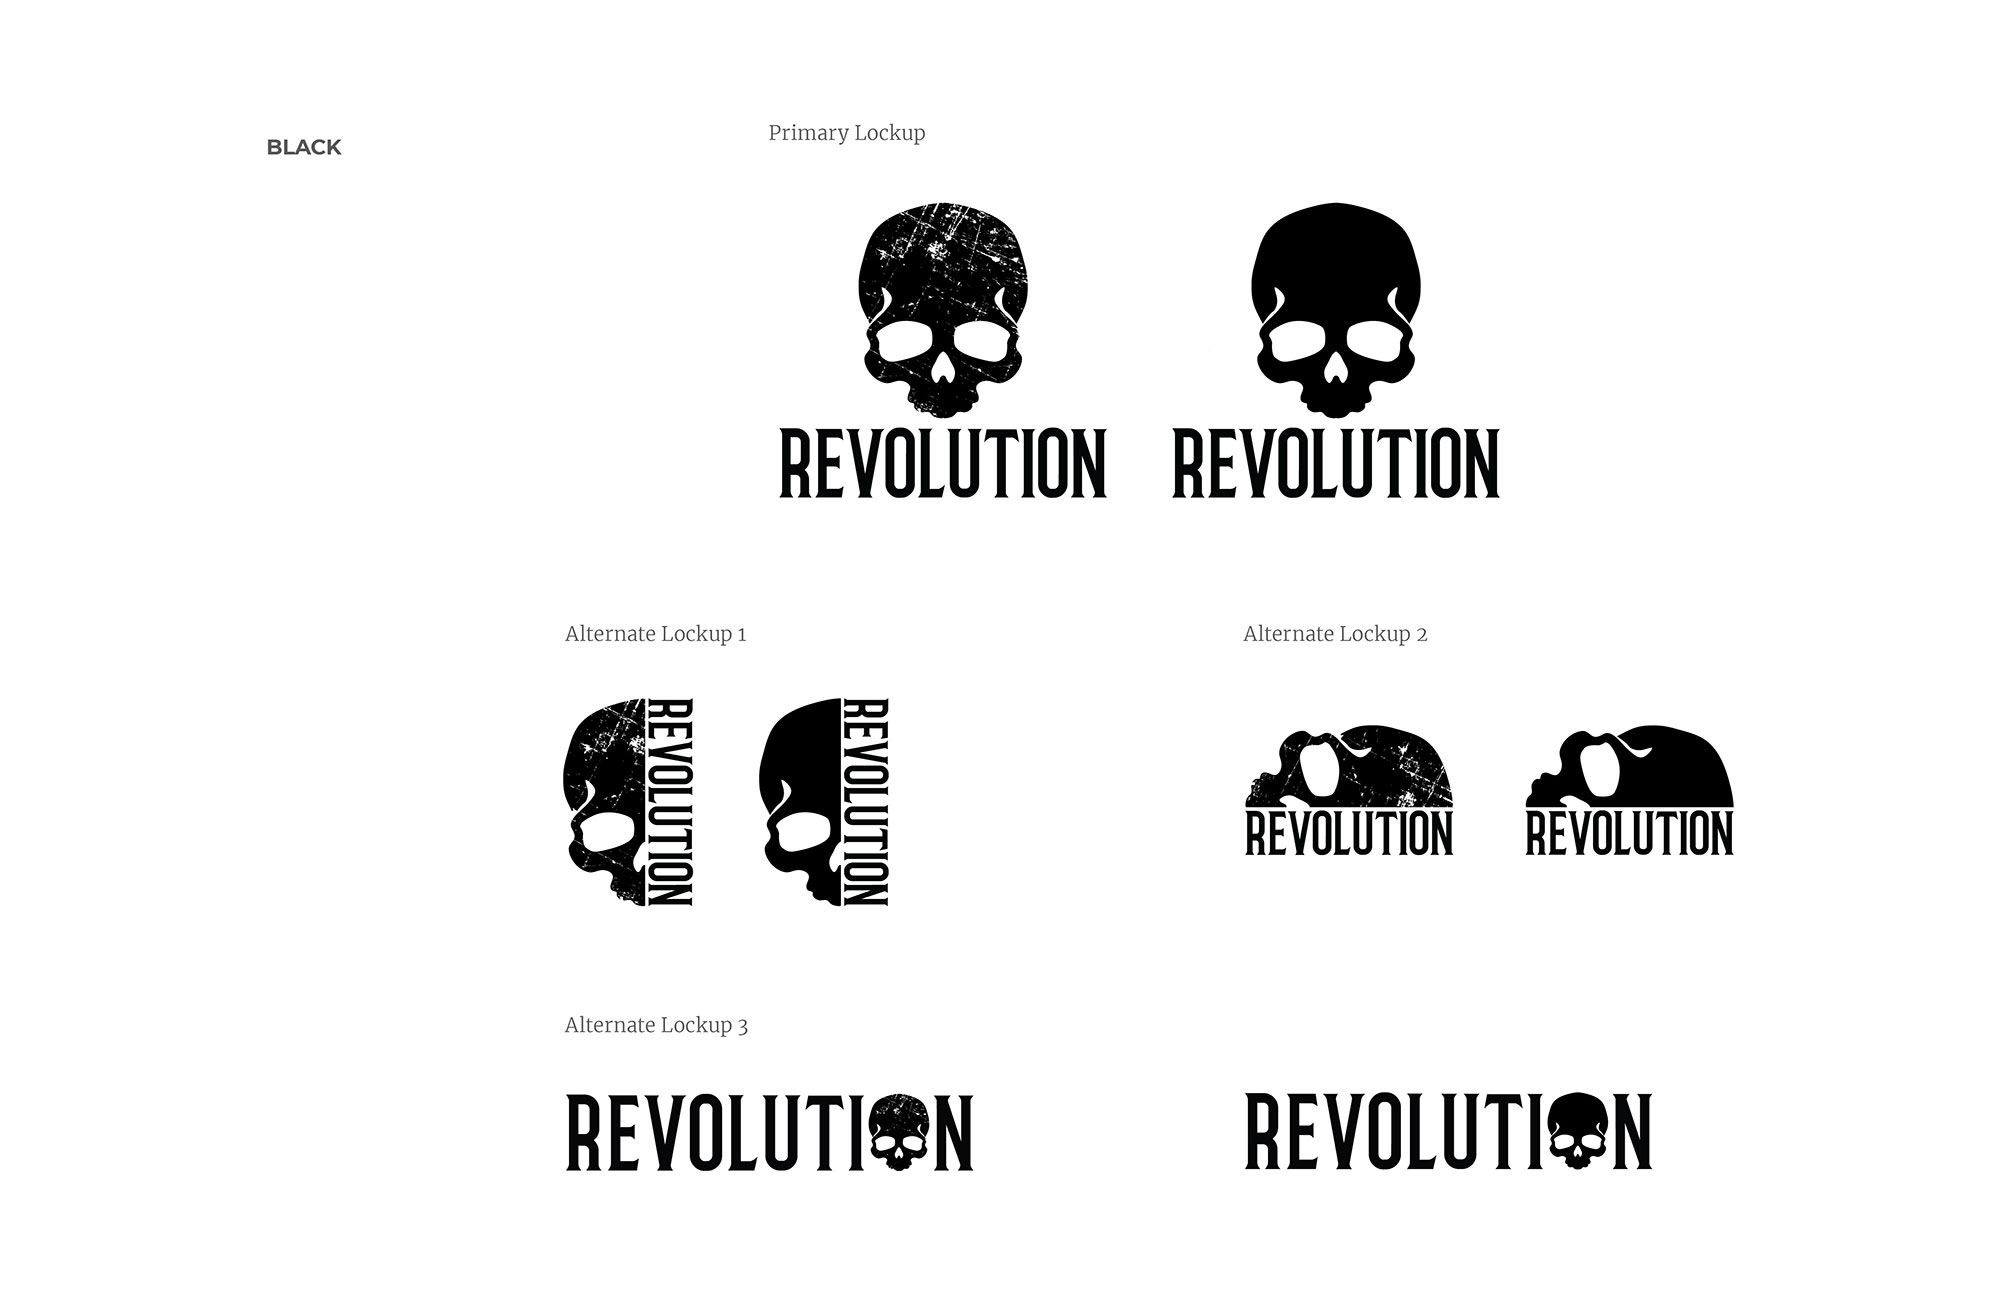 Revolution_Concepts3-2